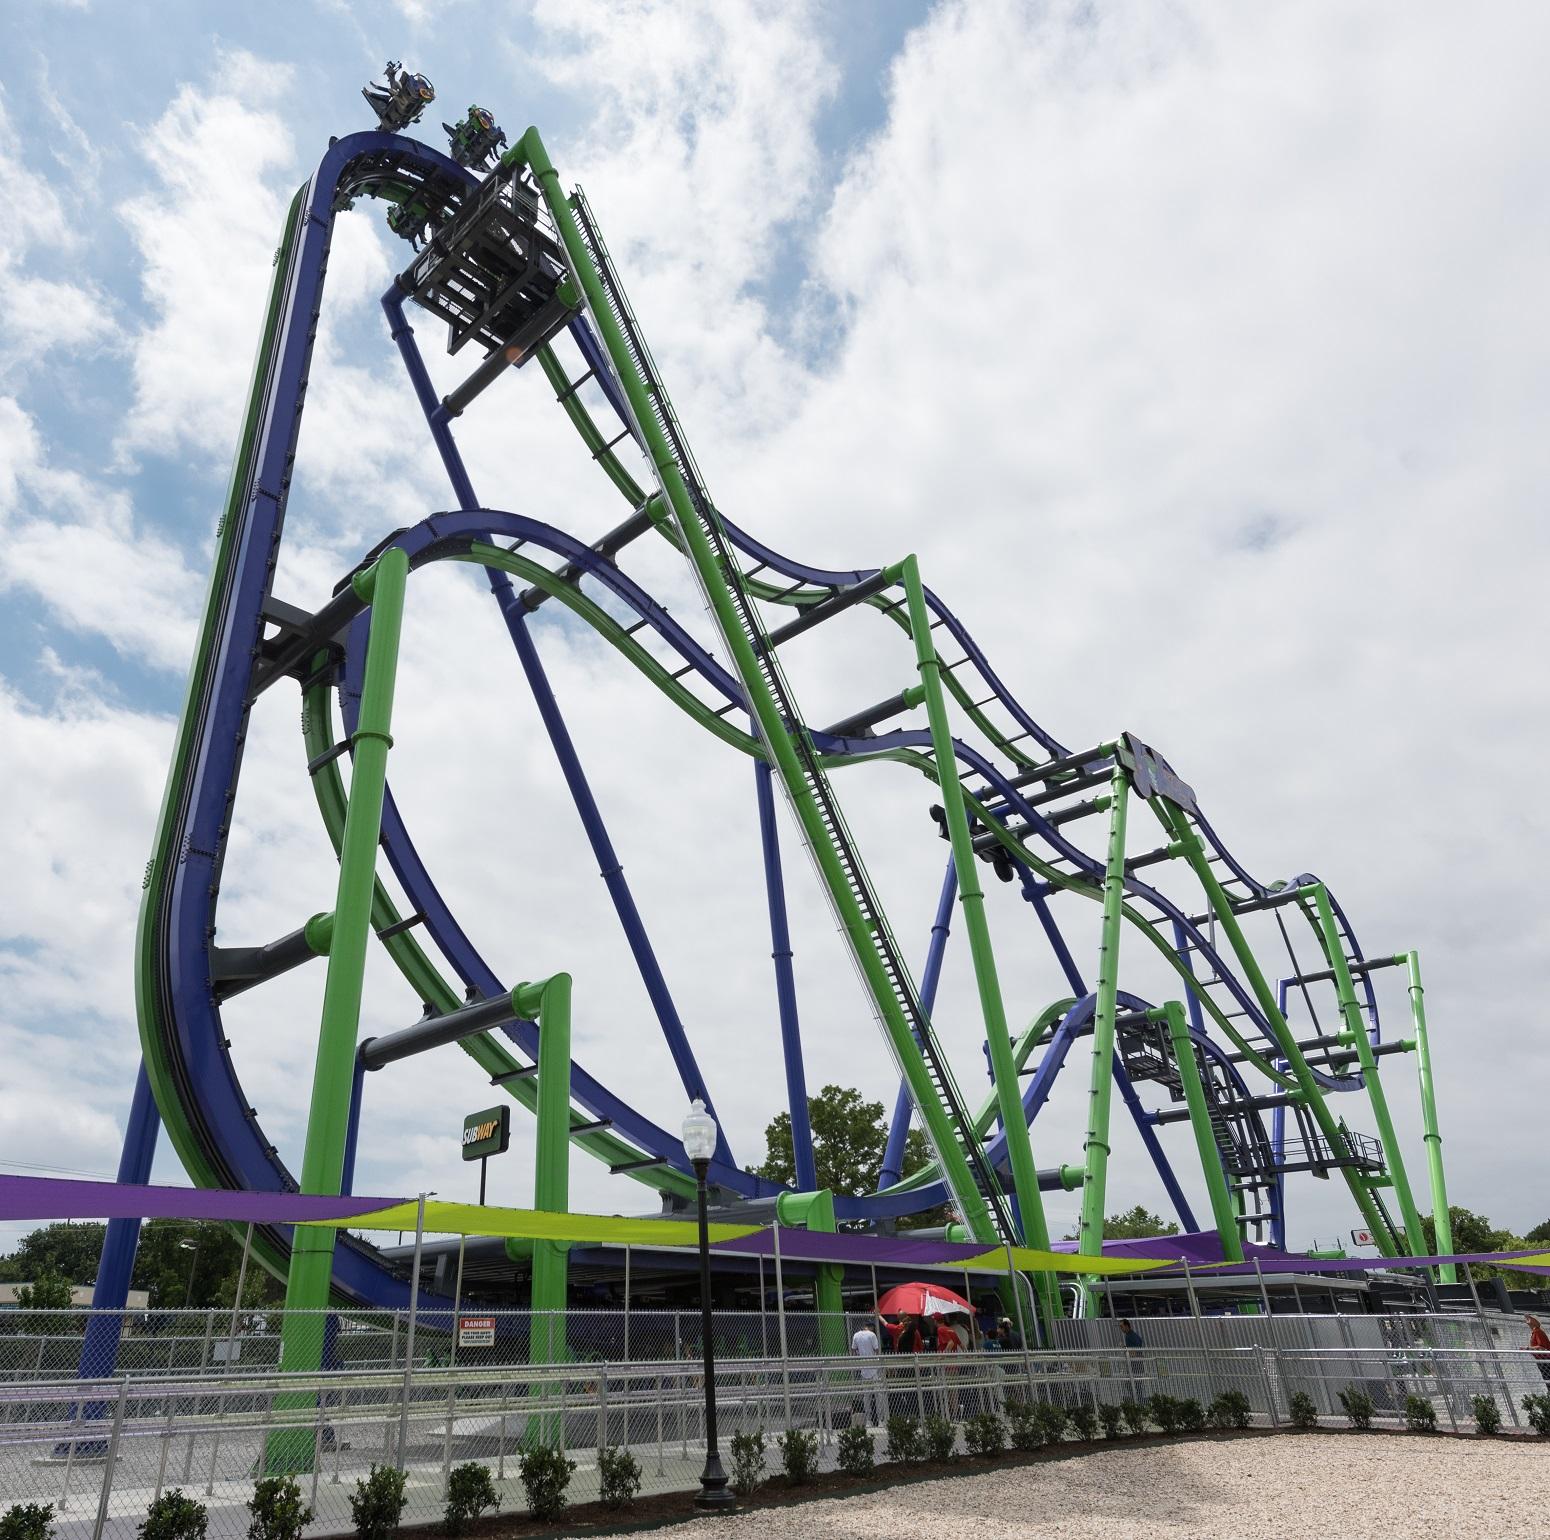 Joker_free_fly_coaster_3sm